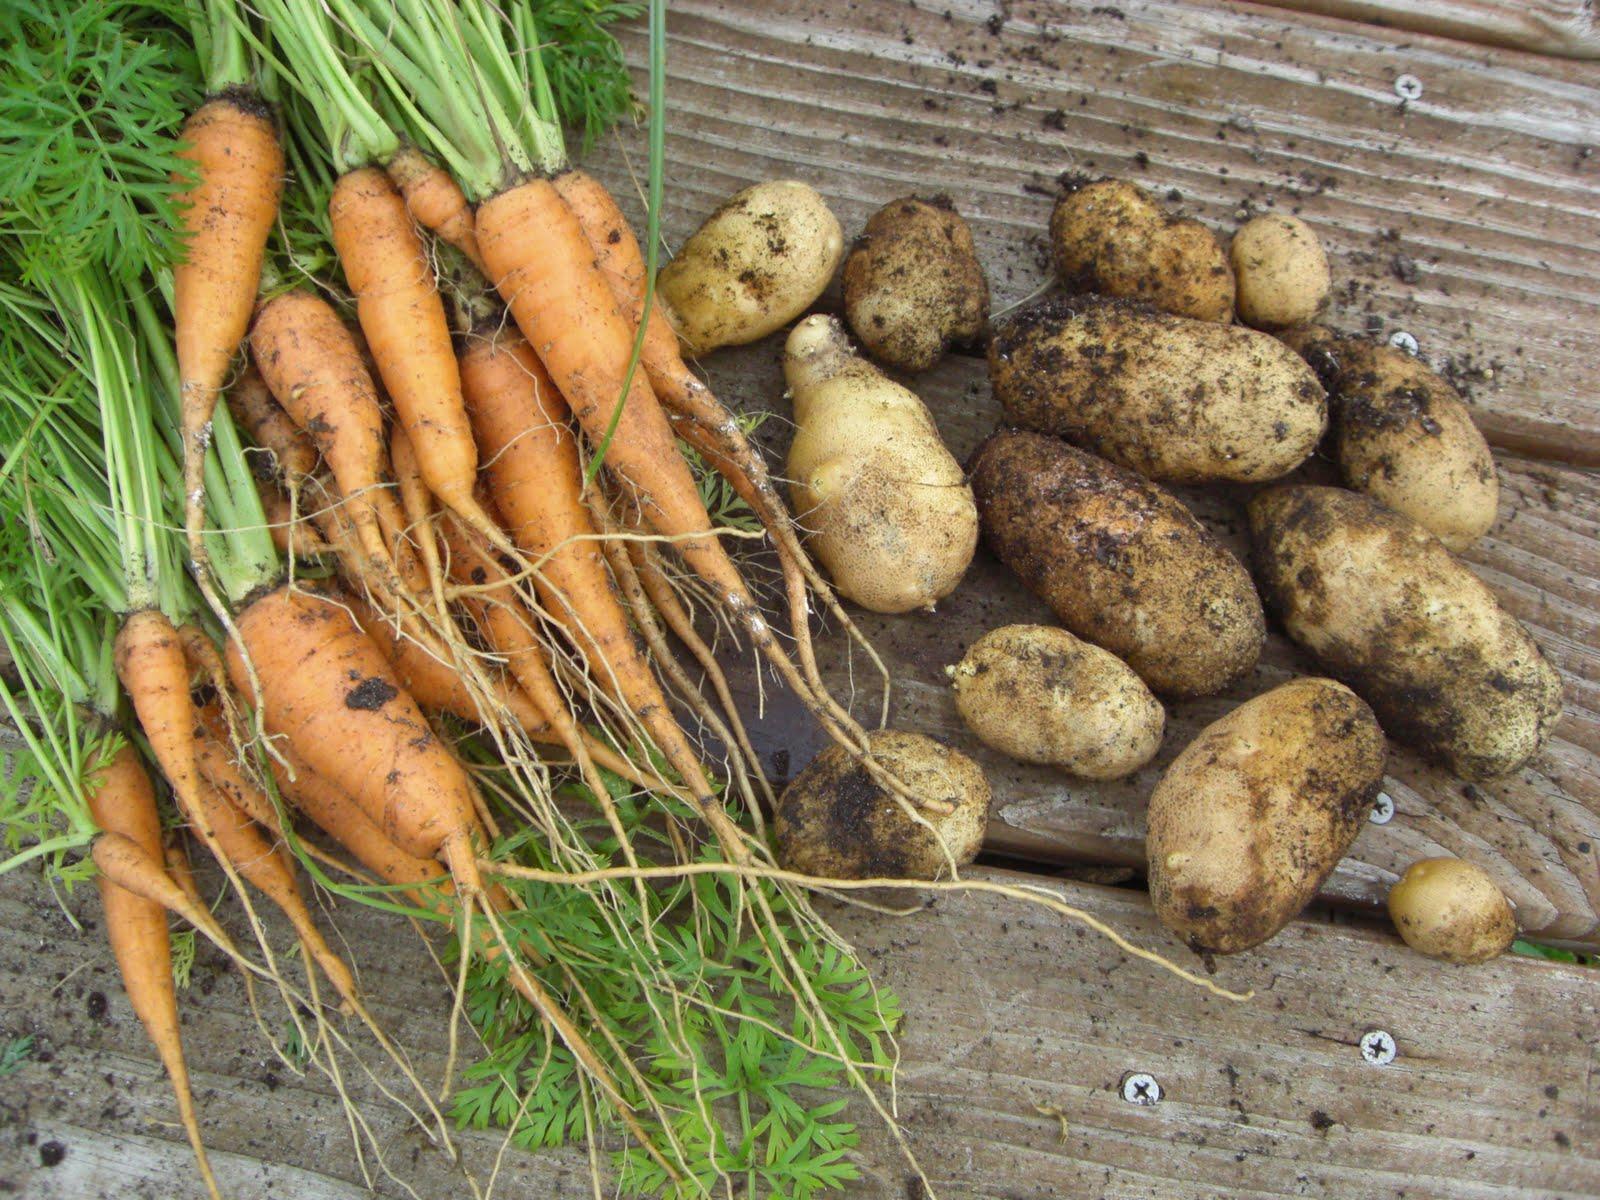 Gleeza: Apples, Potatoes and Carrots